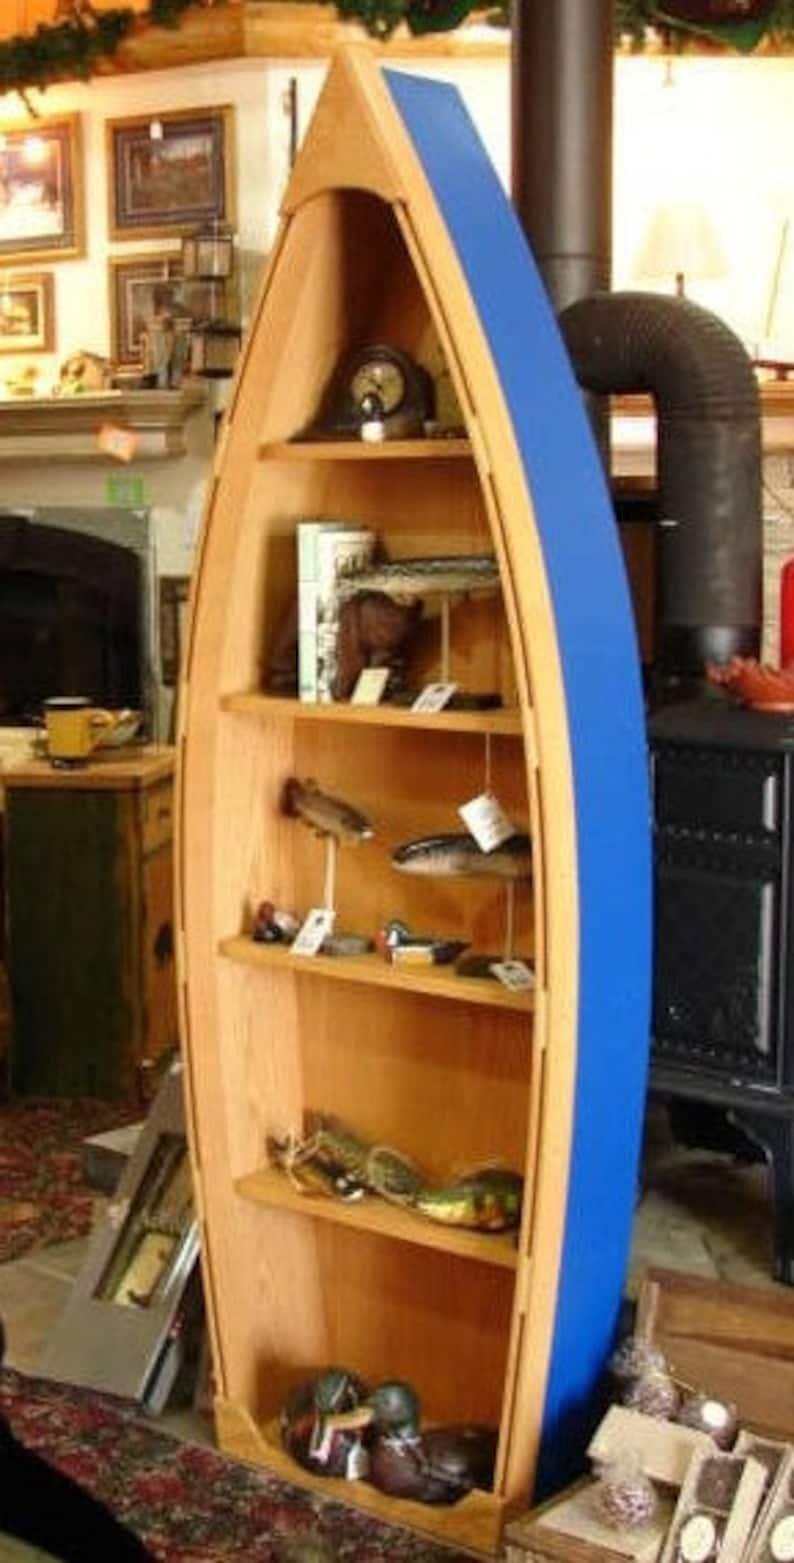 6 Foot Handcrafted 12 14 Weeks To Start Building Wood Row Boat Shelf Bookshelf Bookcase Nautical